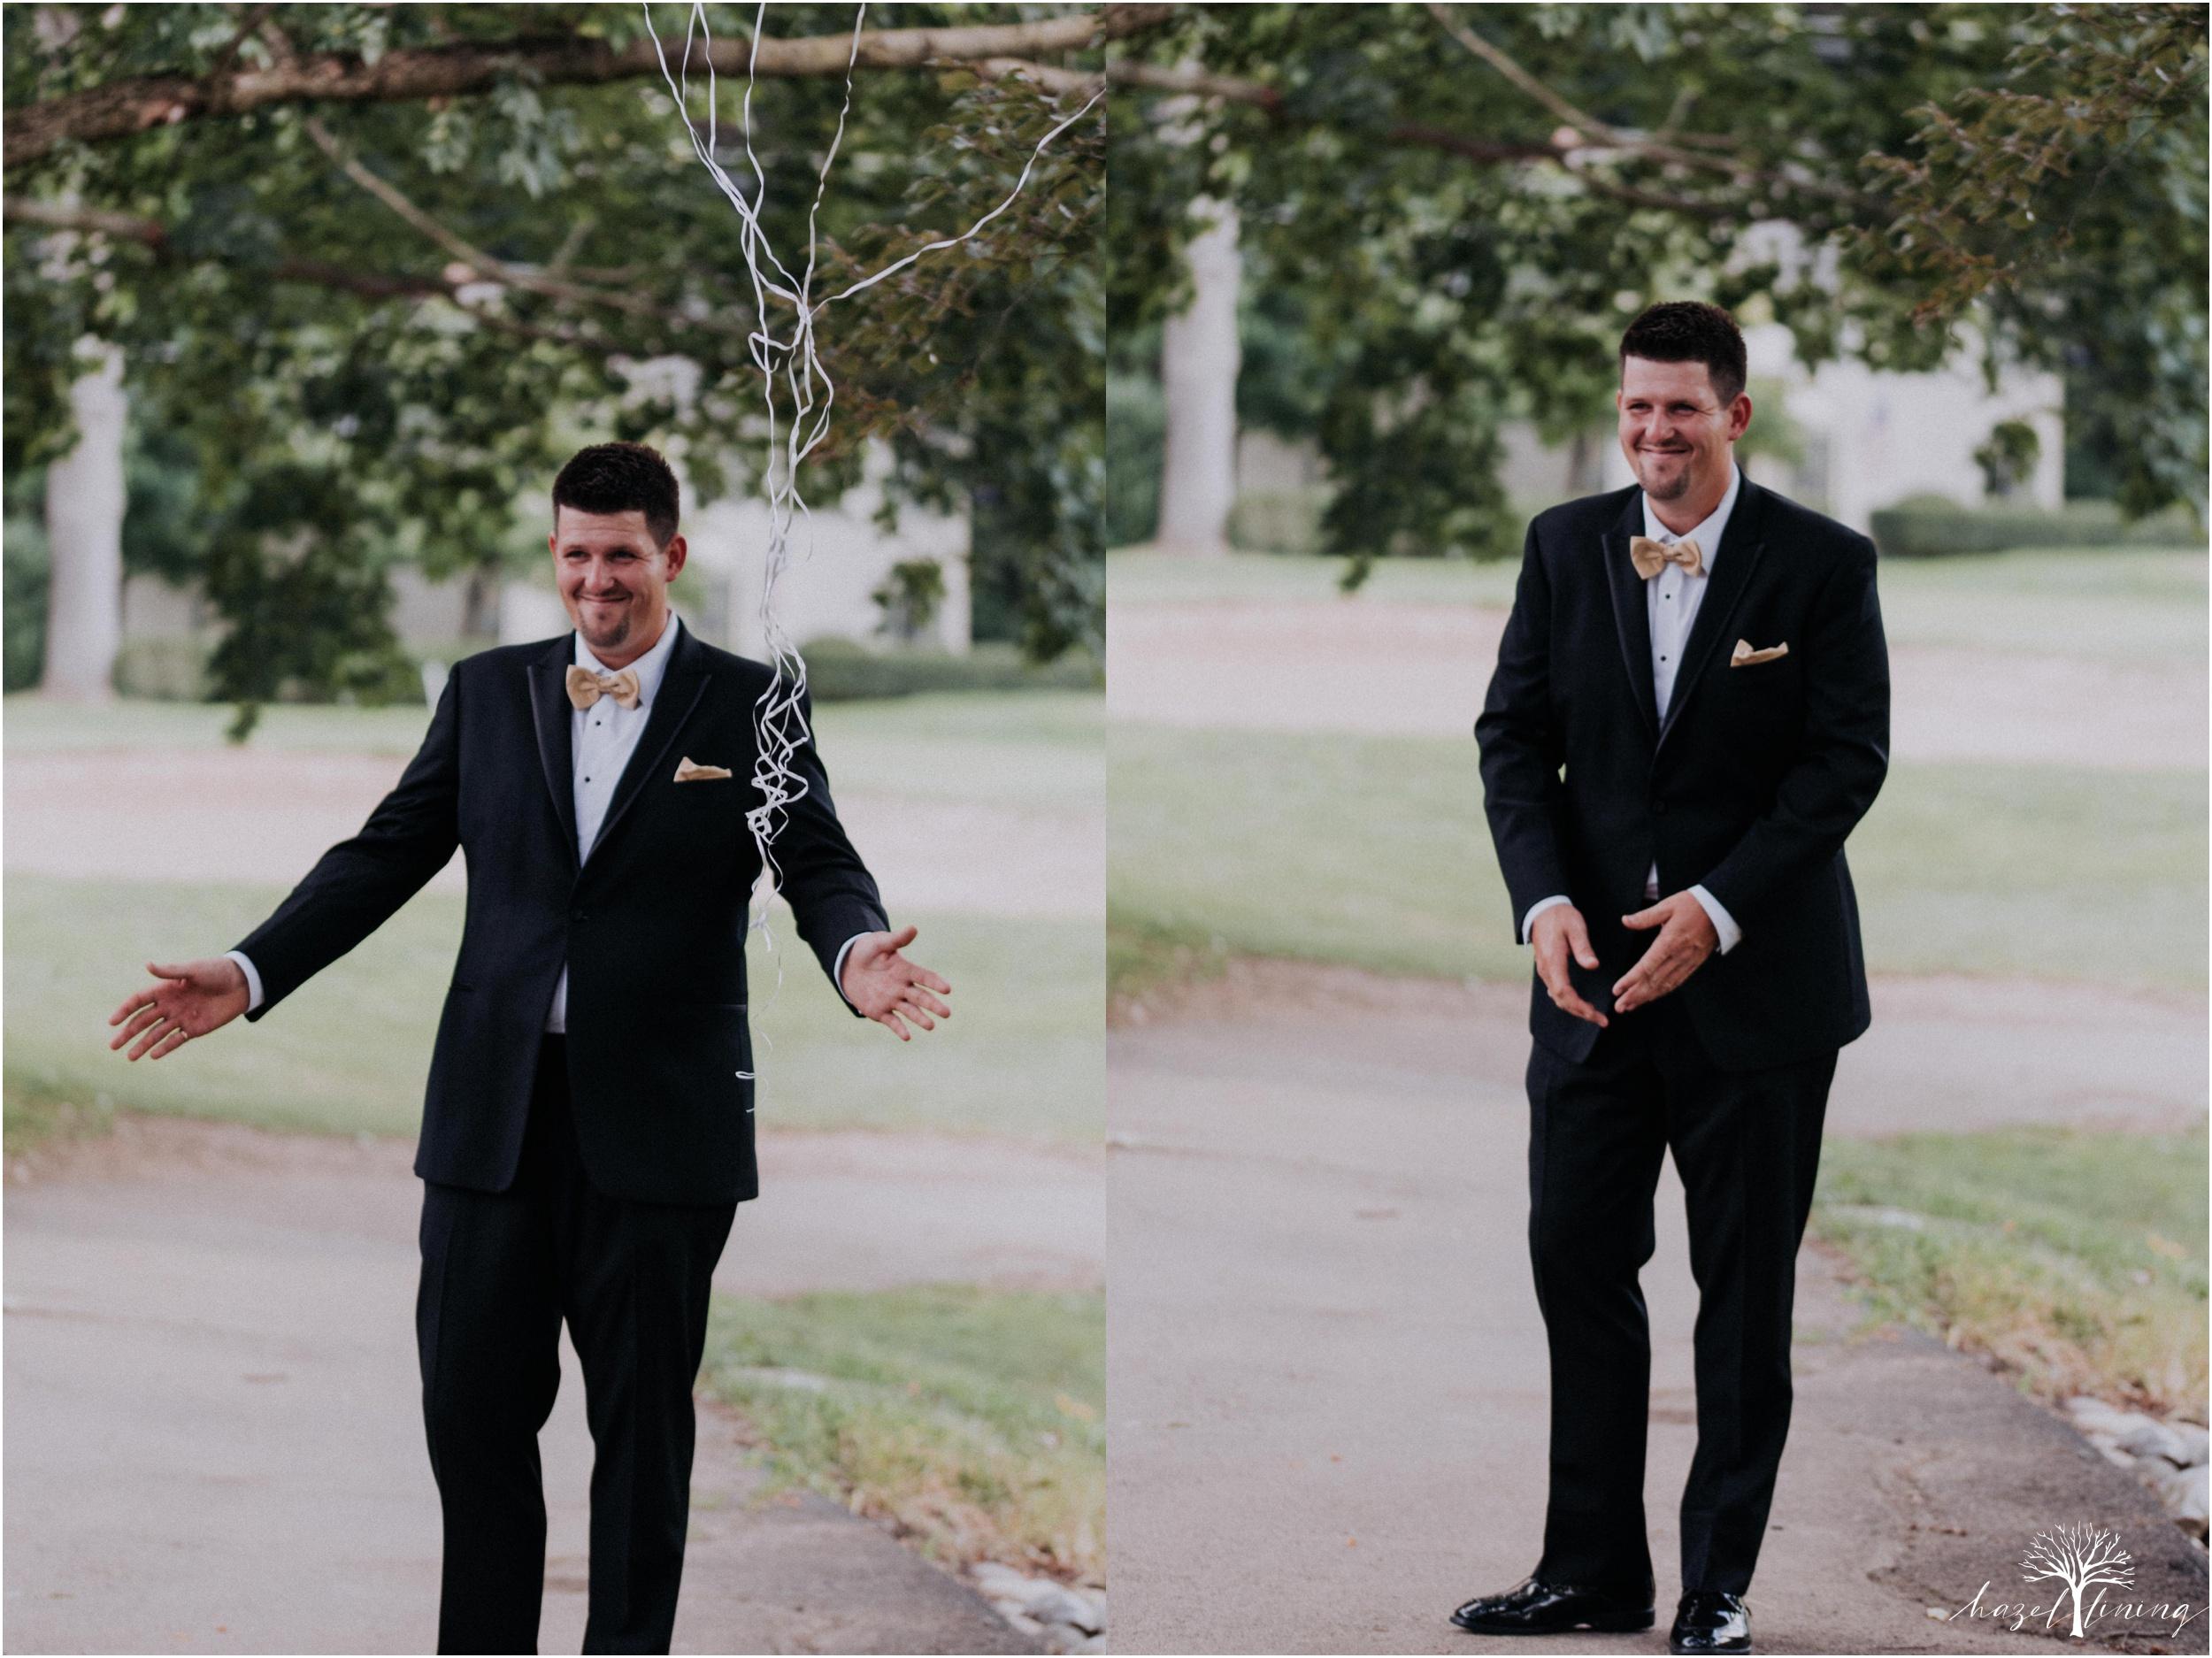 elizabeth-doelp-andrew-foreback-middletown-country-club-summer-langhorne-pennsylvania-wedding-hazel-lining-travel-wedding-elopement-photography_0031.jpg